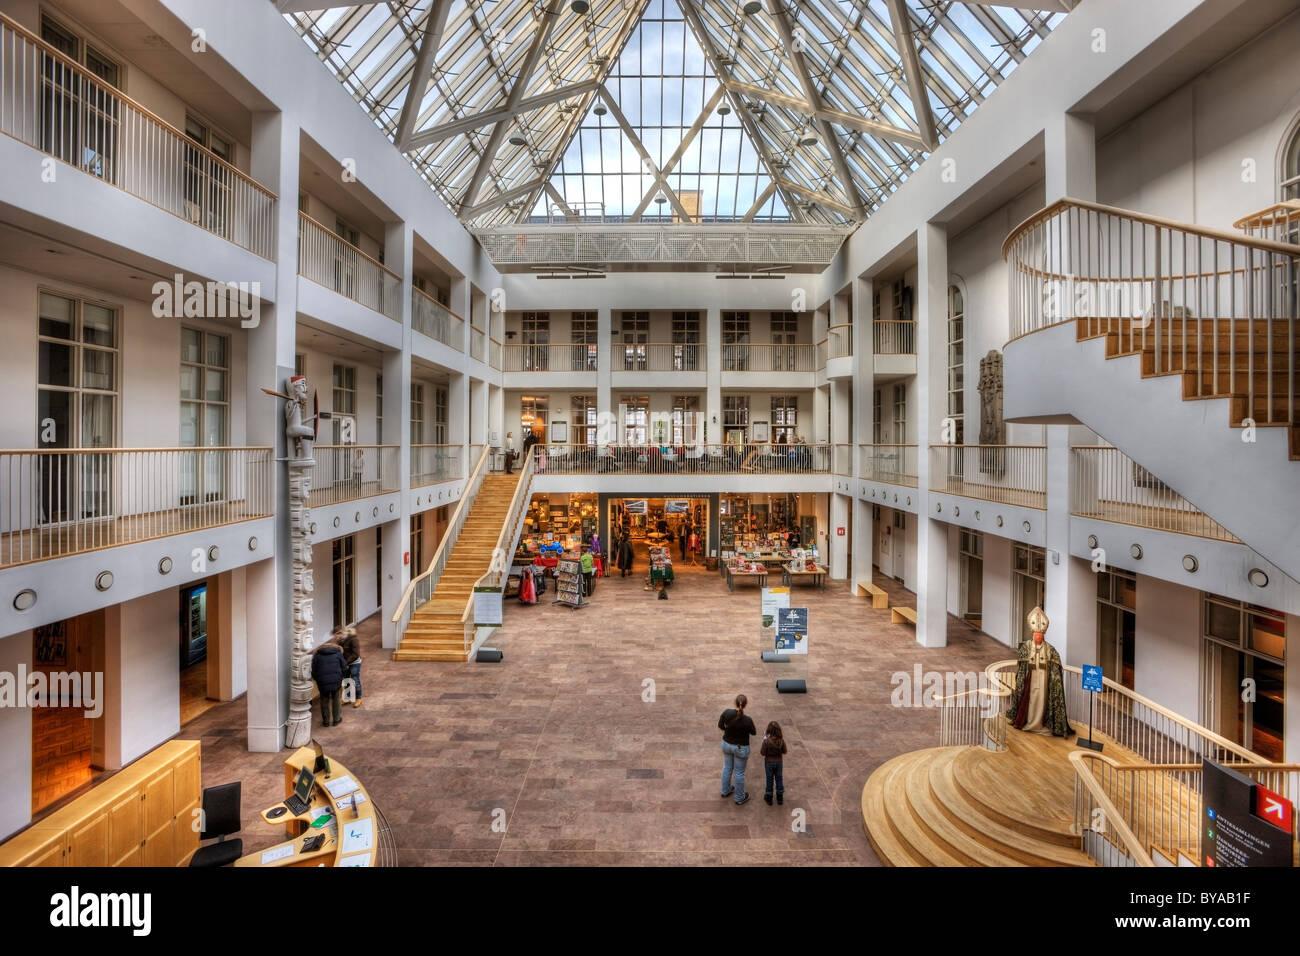 Le Musée National, Nationalmuseet, Copenhague, Danemark, Europe Photo Stock